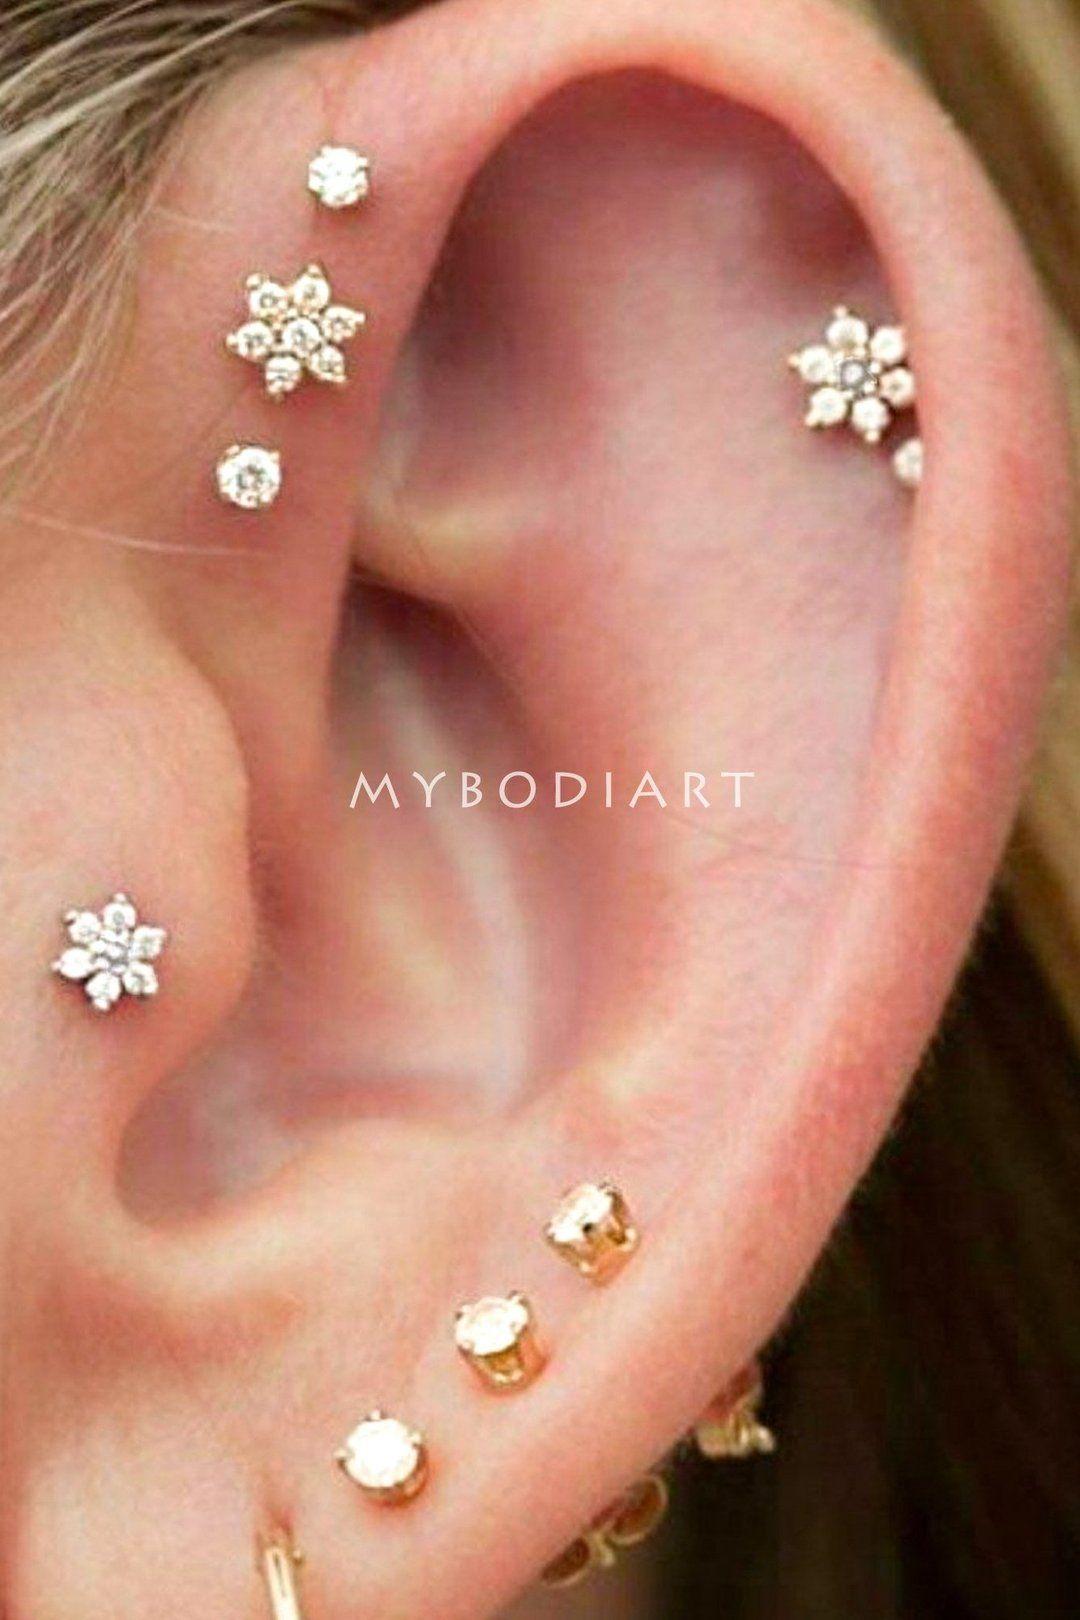 Cute Multiple Ear Piercing Ideas for Teenagers – Minimalist Classy Dainty Crystal Flower 16G Earring Stud for Cartilage, Helix, Conch, Tragus – Linda oreja múltiple Piercing Ideas para adolescentes – www.MyBodiArt.com